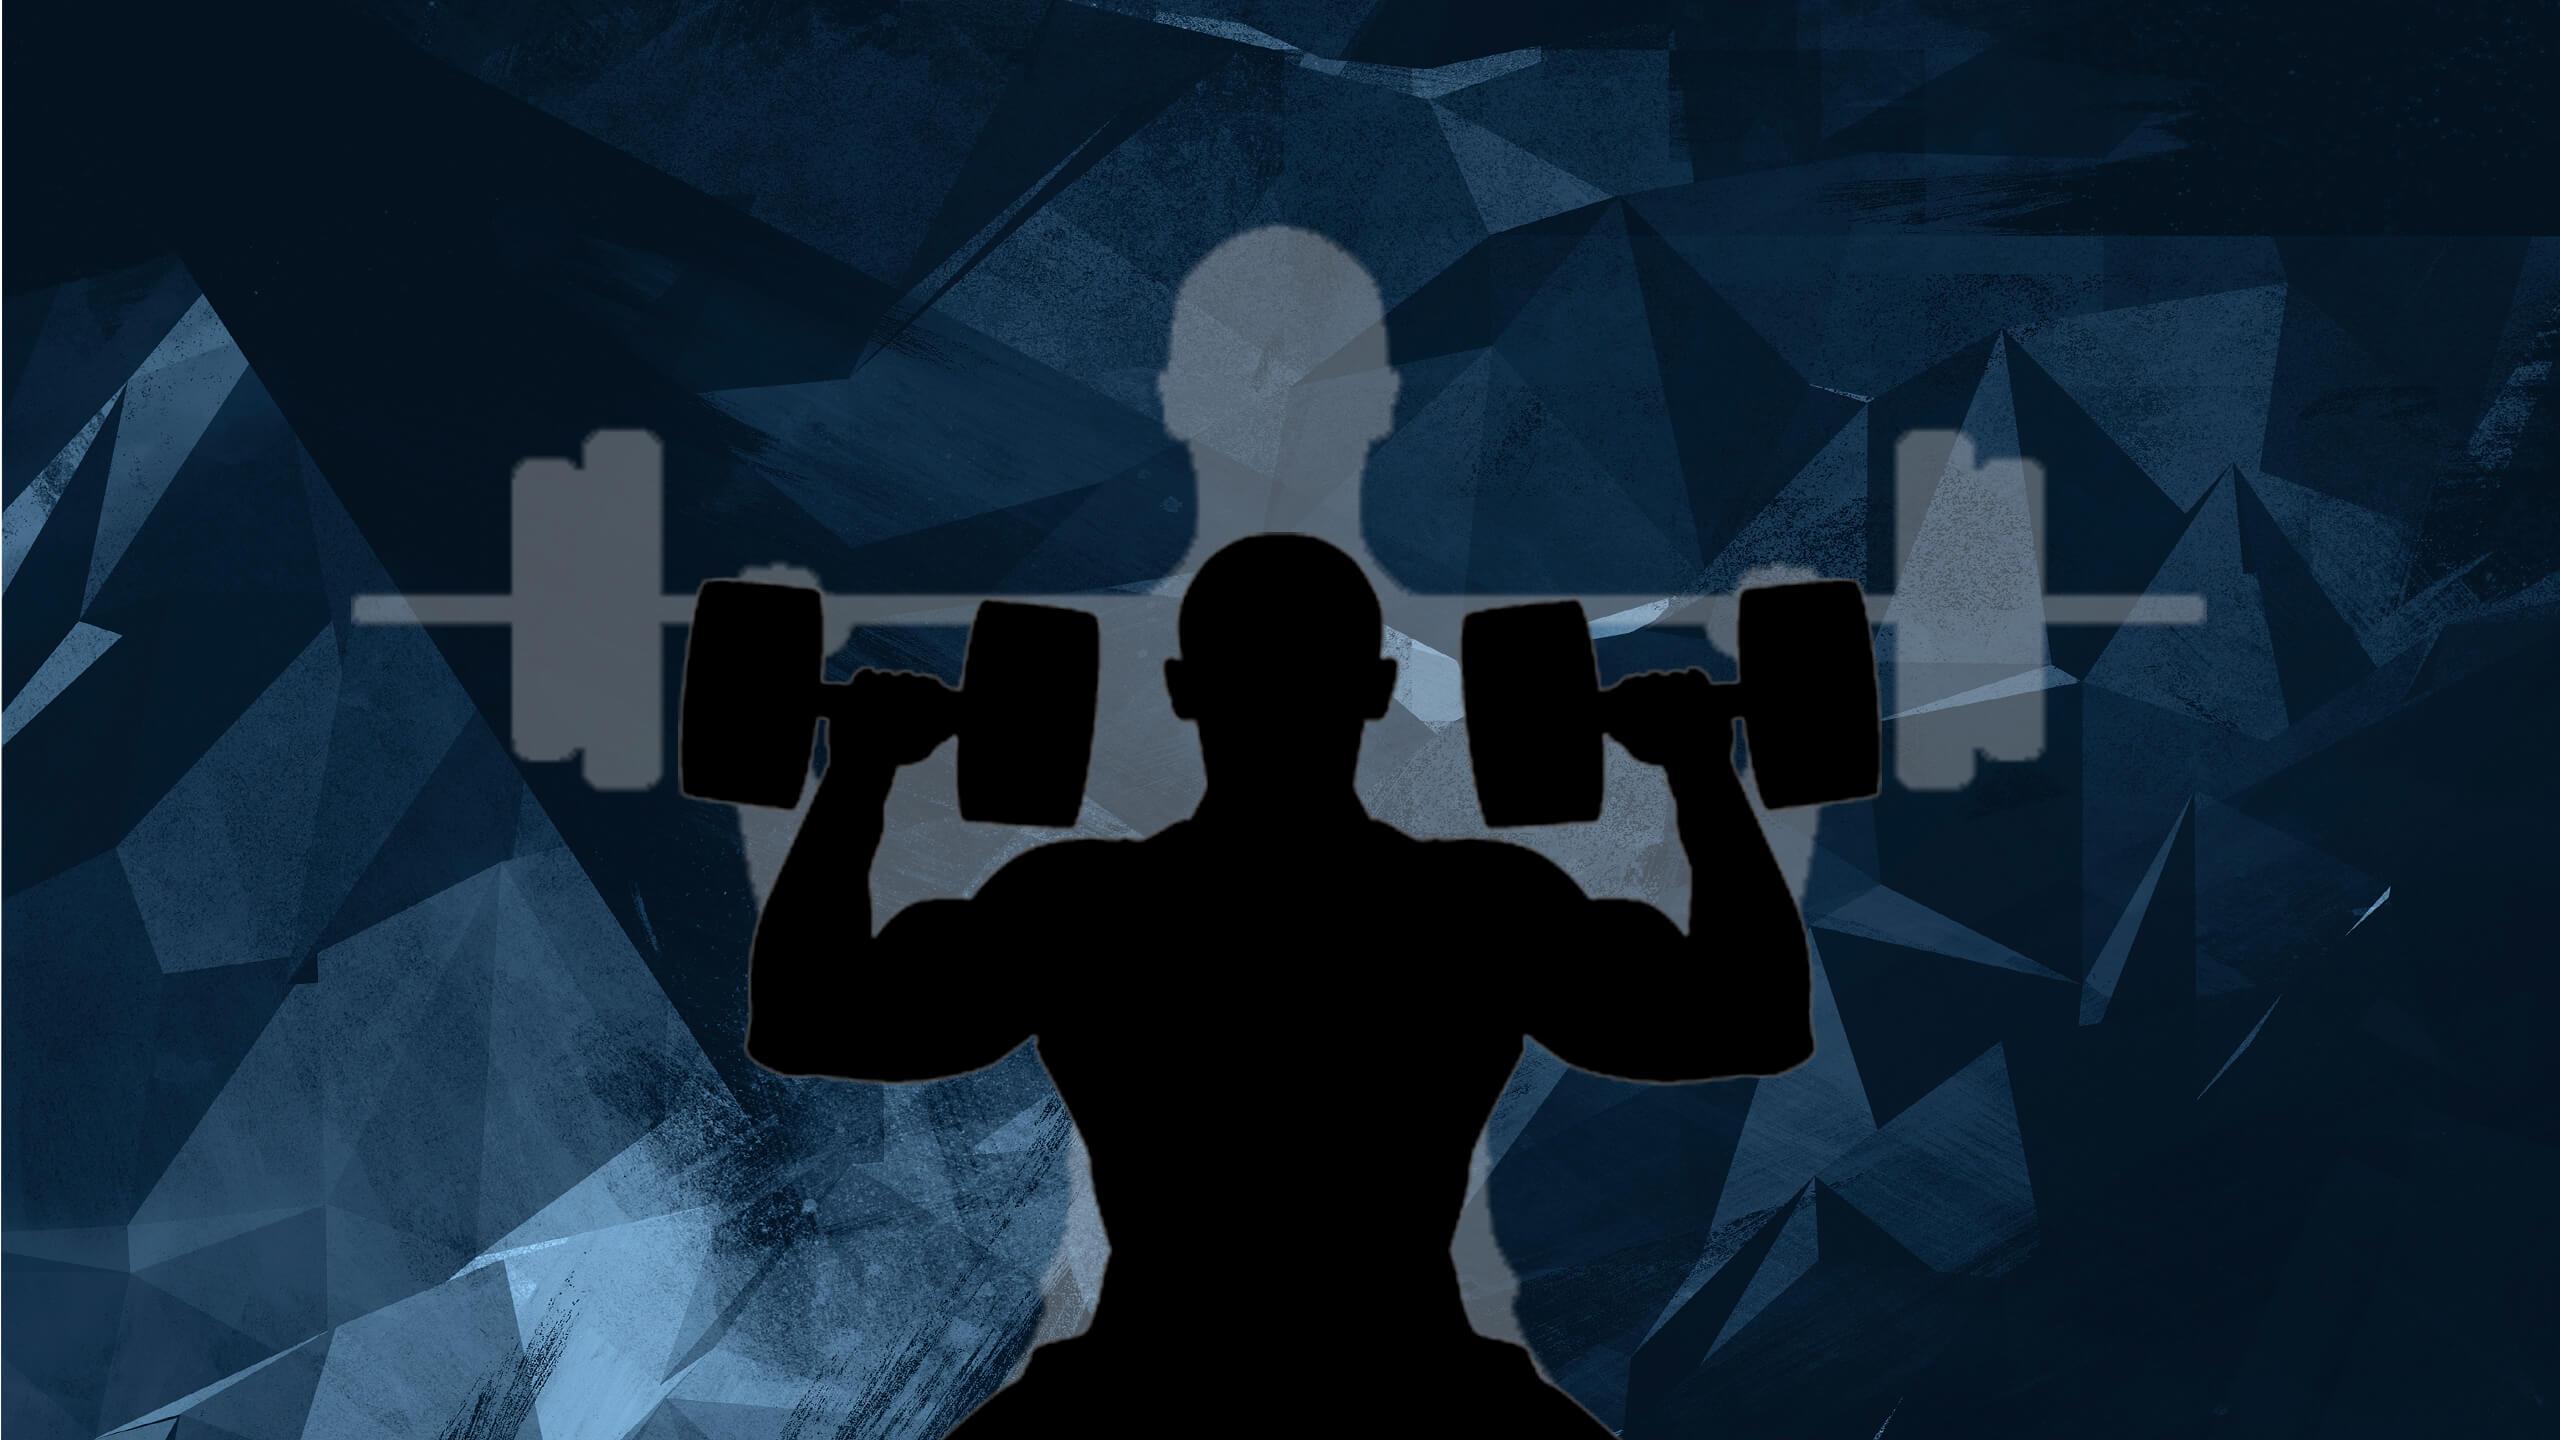 Картинка фитнес для шапки ютуба с силуэтом мужчины с гантелями.